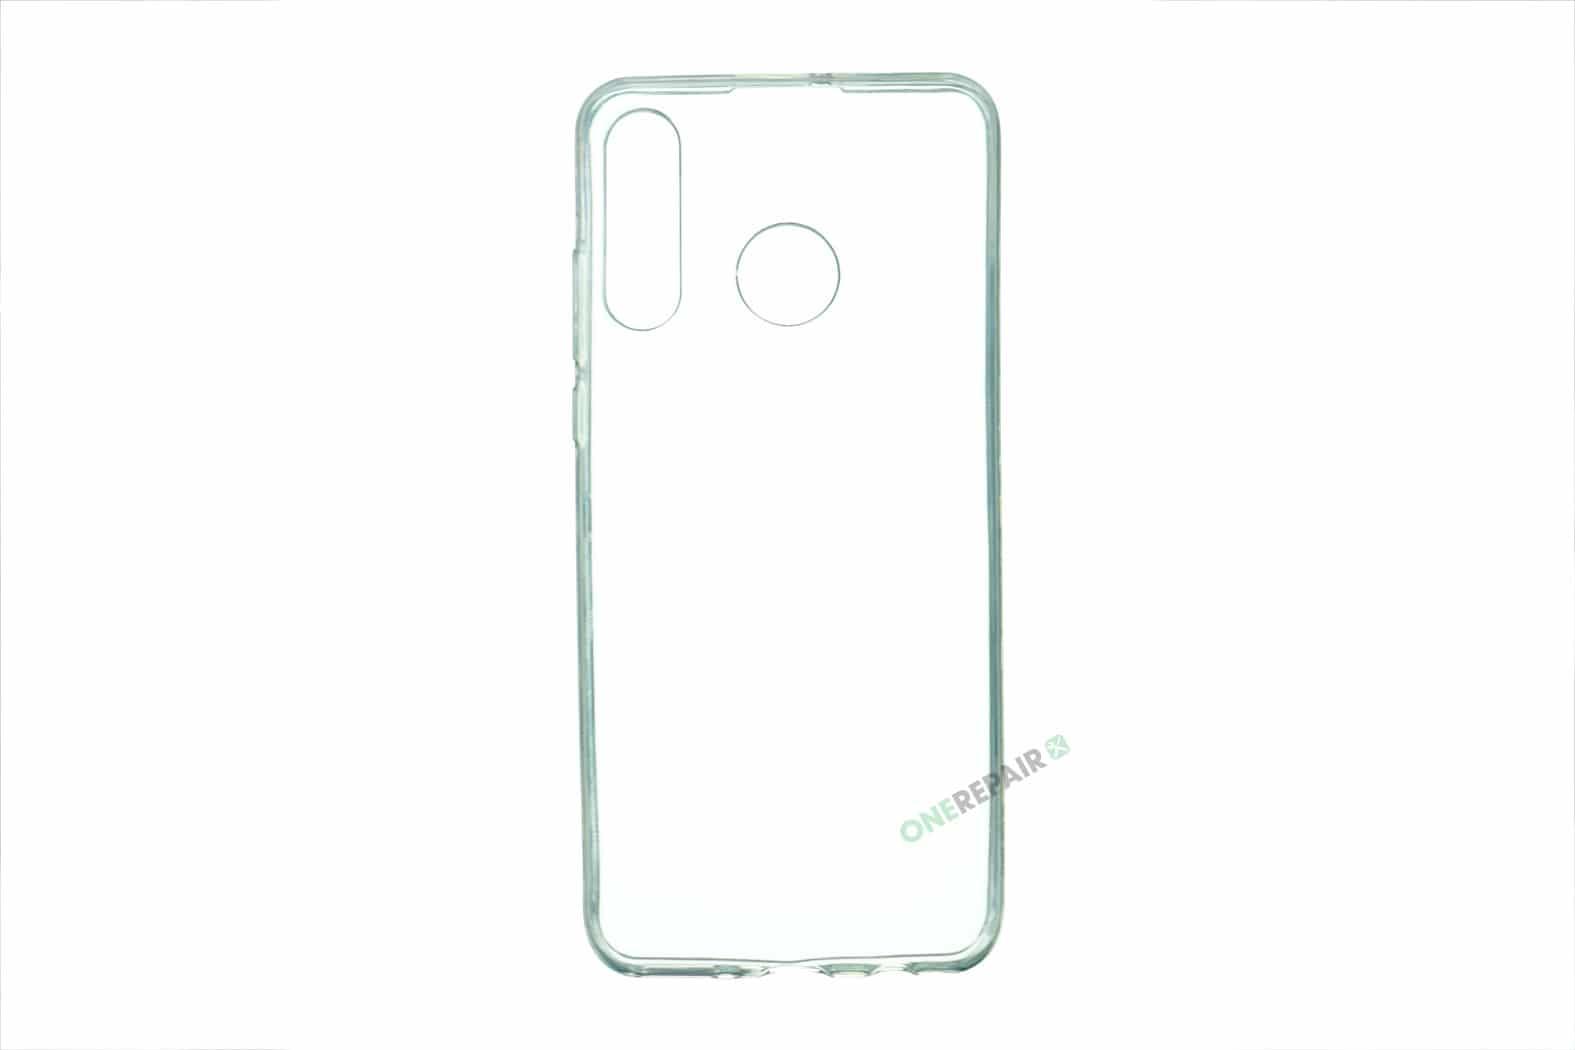 Huawei P30 Lite cover, Gennemsigtig, Transparant, Gummicover